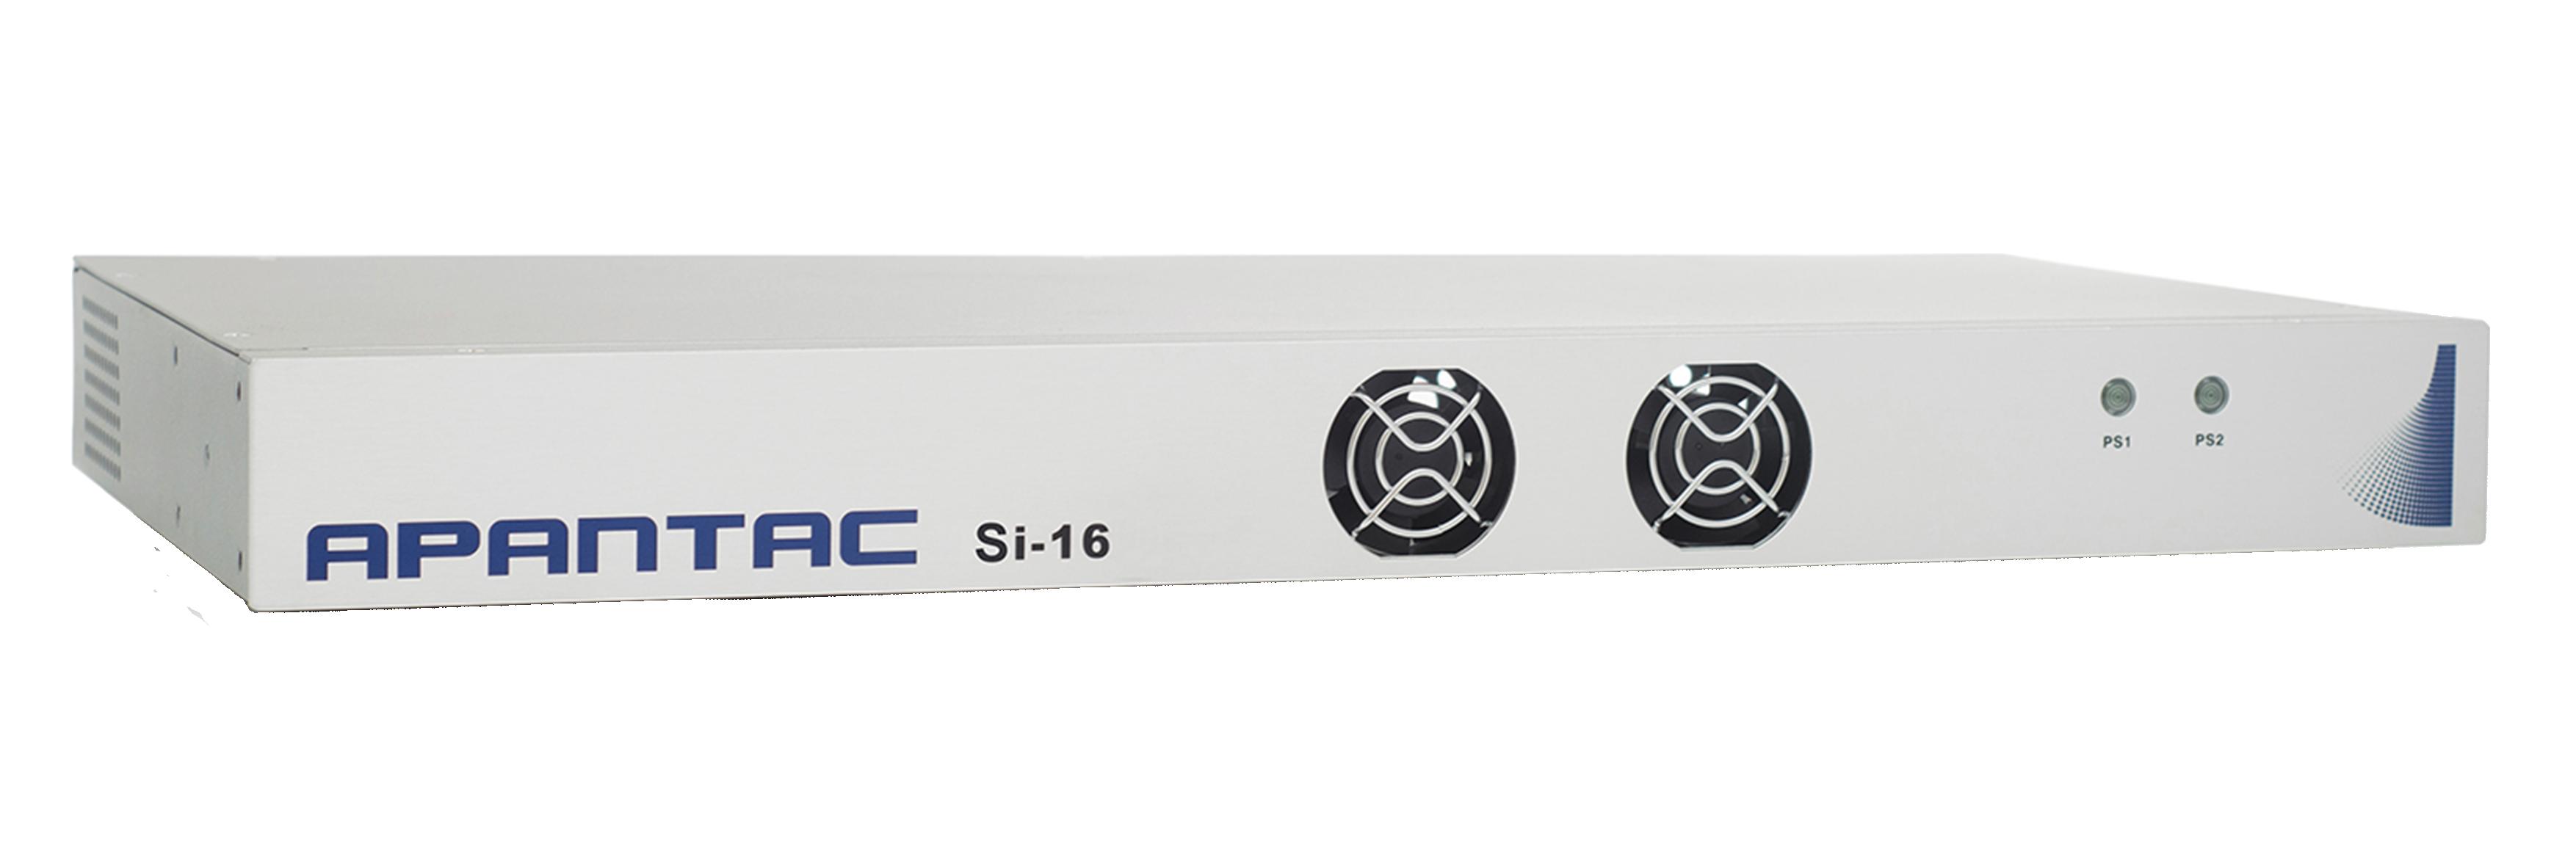 Apantac_Si-16_Video Over IP Multiviewer